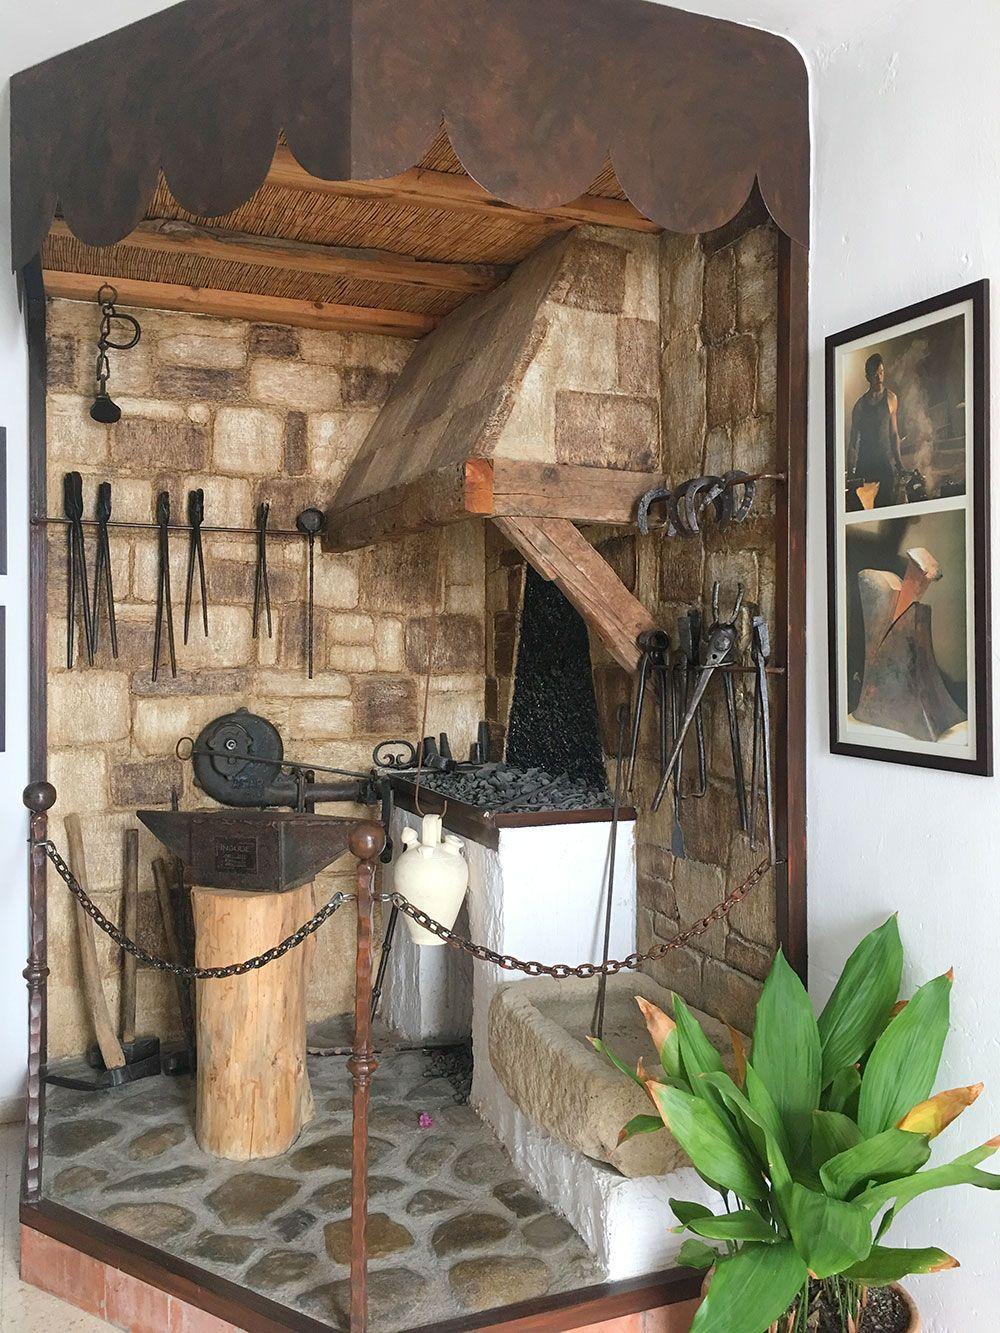 Qué ver en Iznájar - Fragua